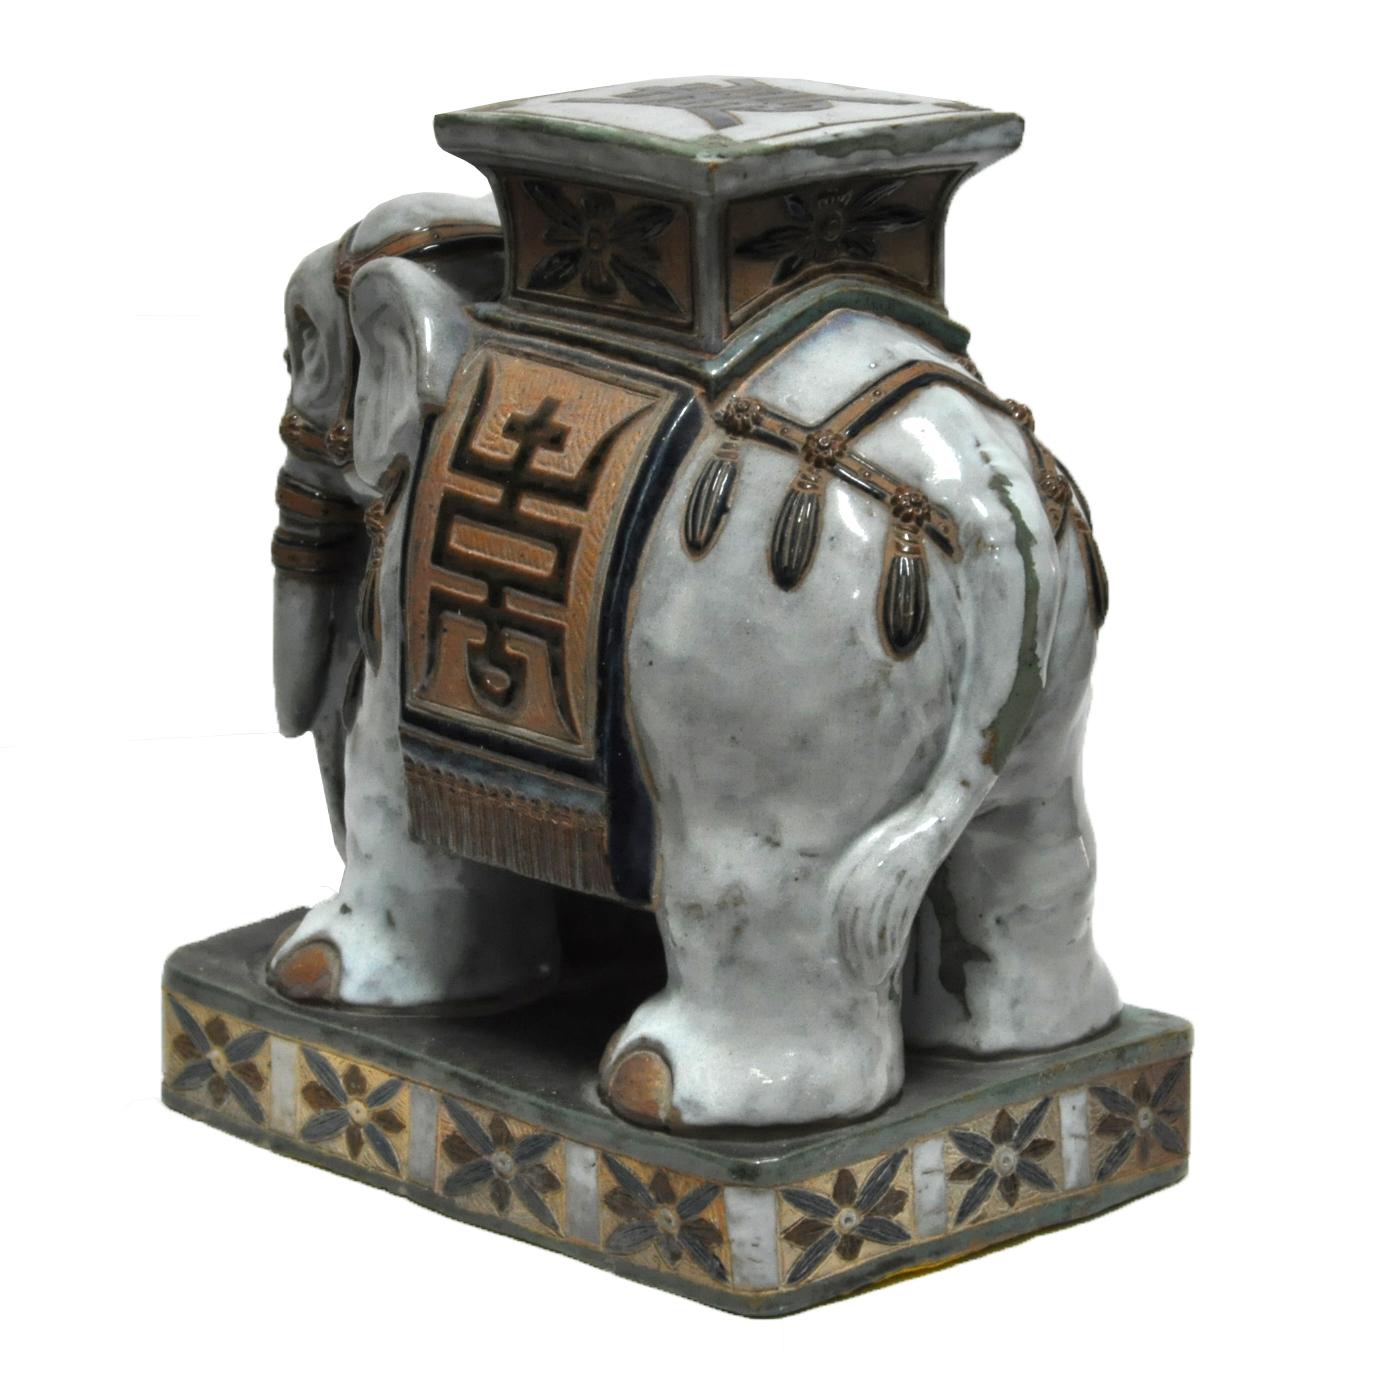 Vintage Ceramic Elephant Garden Stools #31 - Petite Vintage Elephant Garden Stool